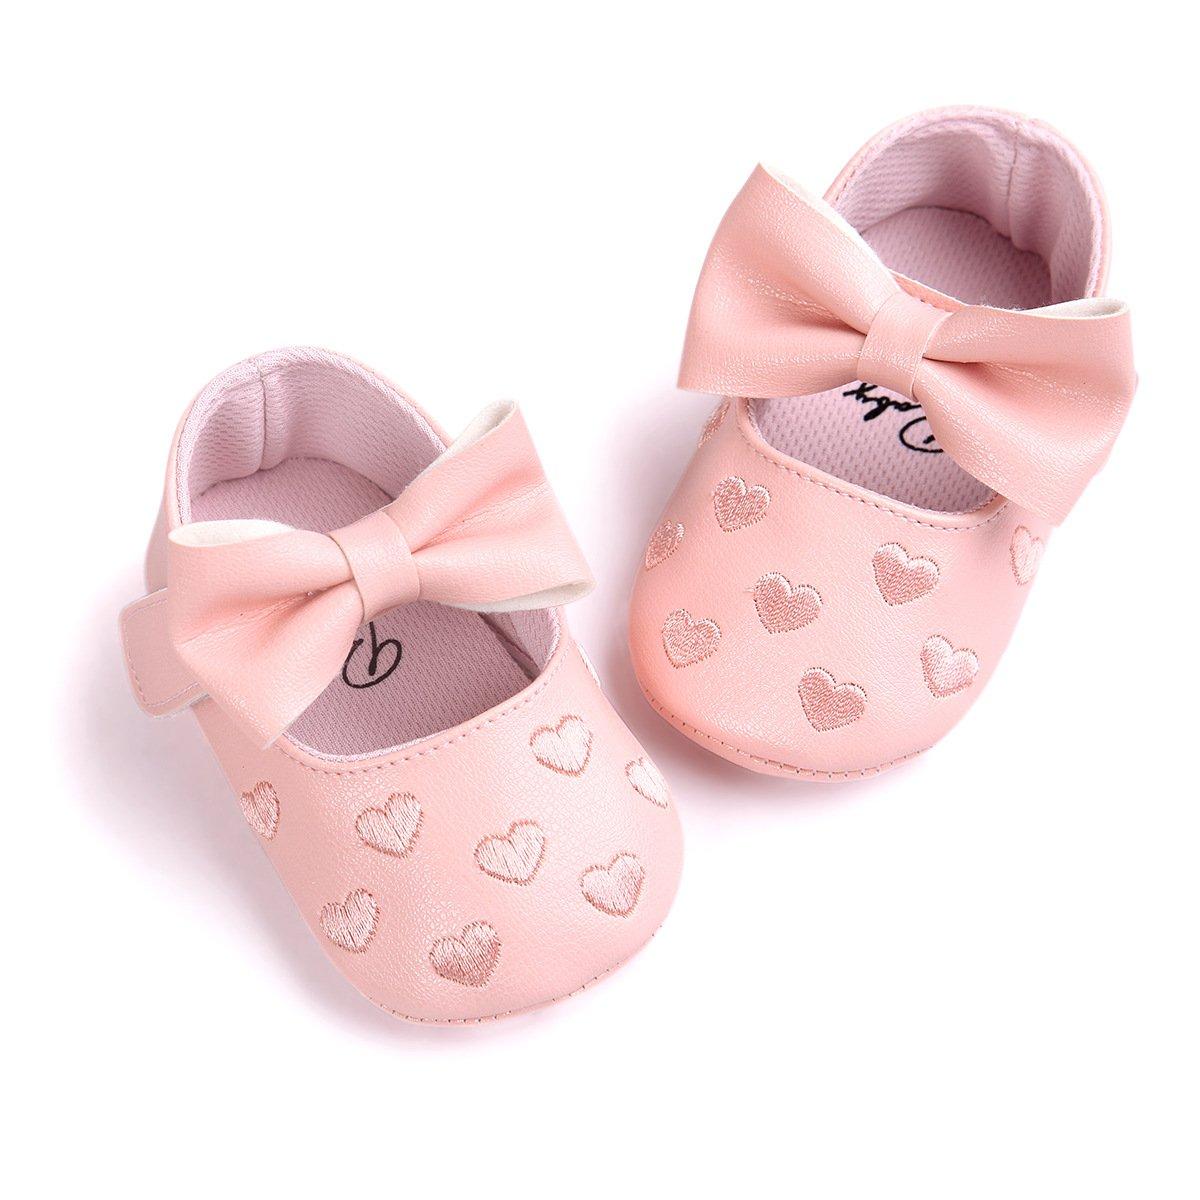 Royal Victory ベビーガールズ B074P39Q46 12cm (6-12months) Heart Pink Heart Pink 12cm (6-12months)